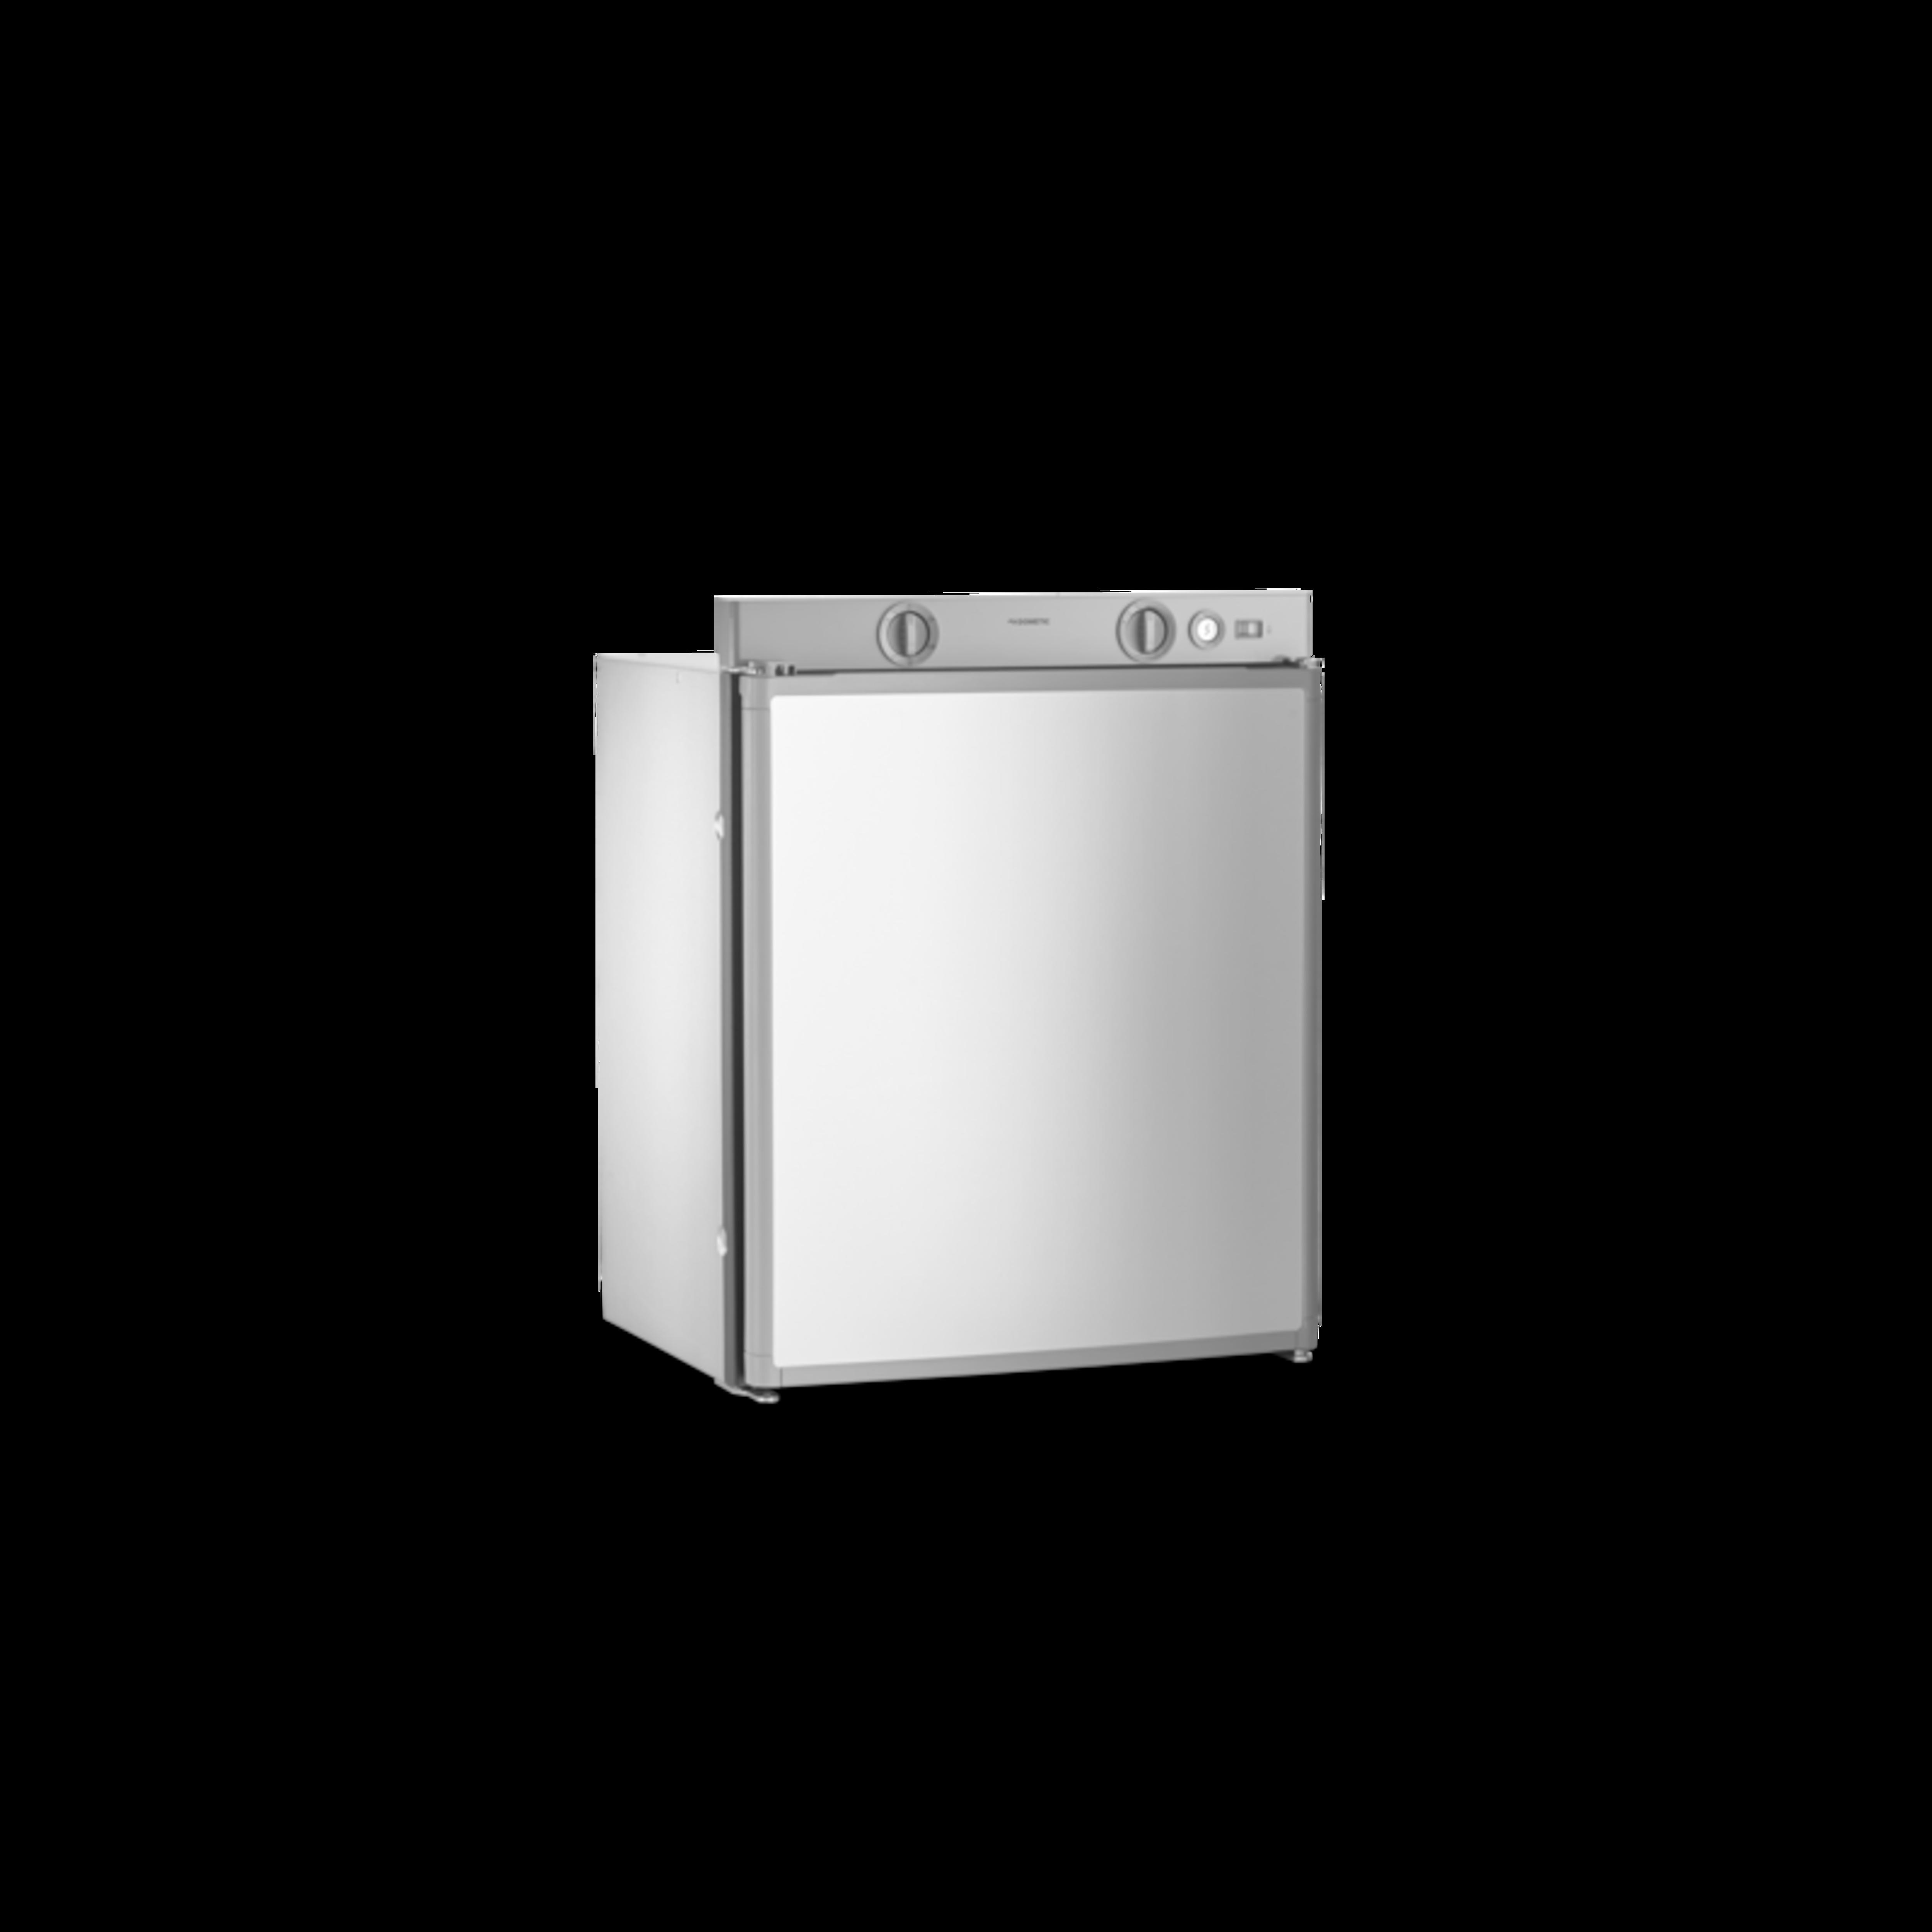 Dometic RM 5310